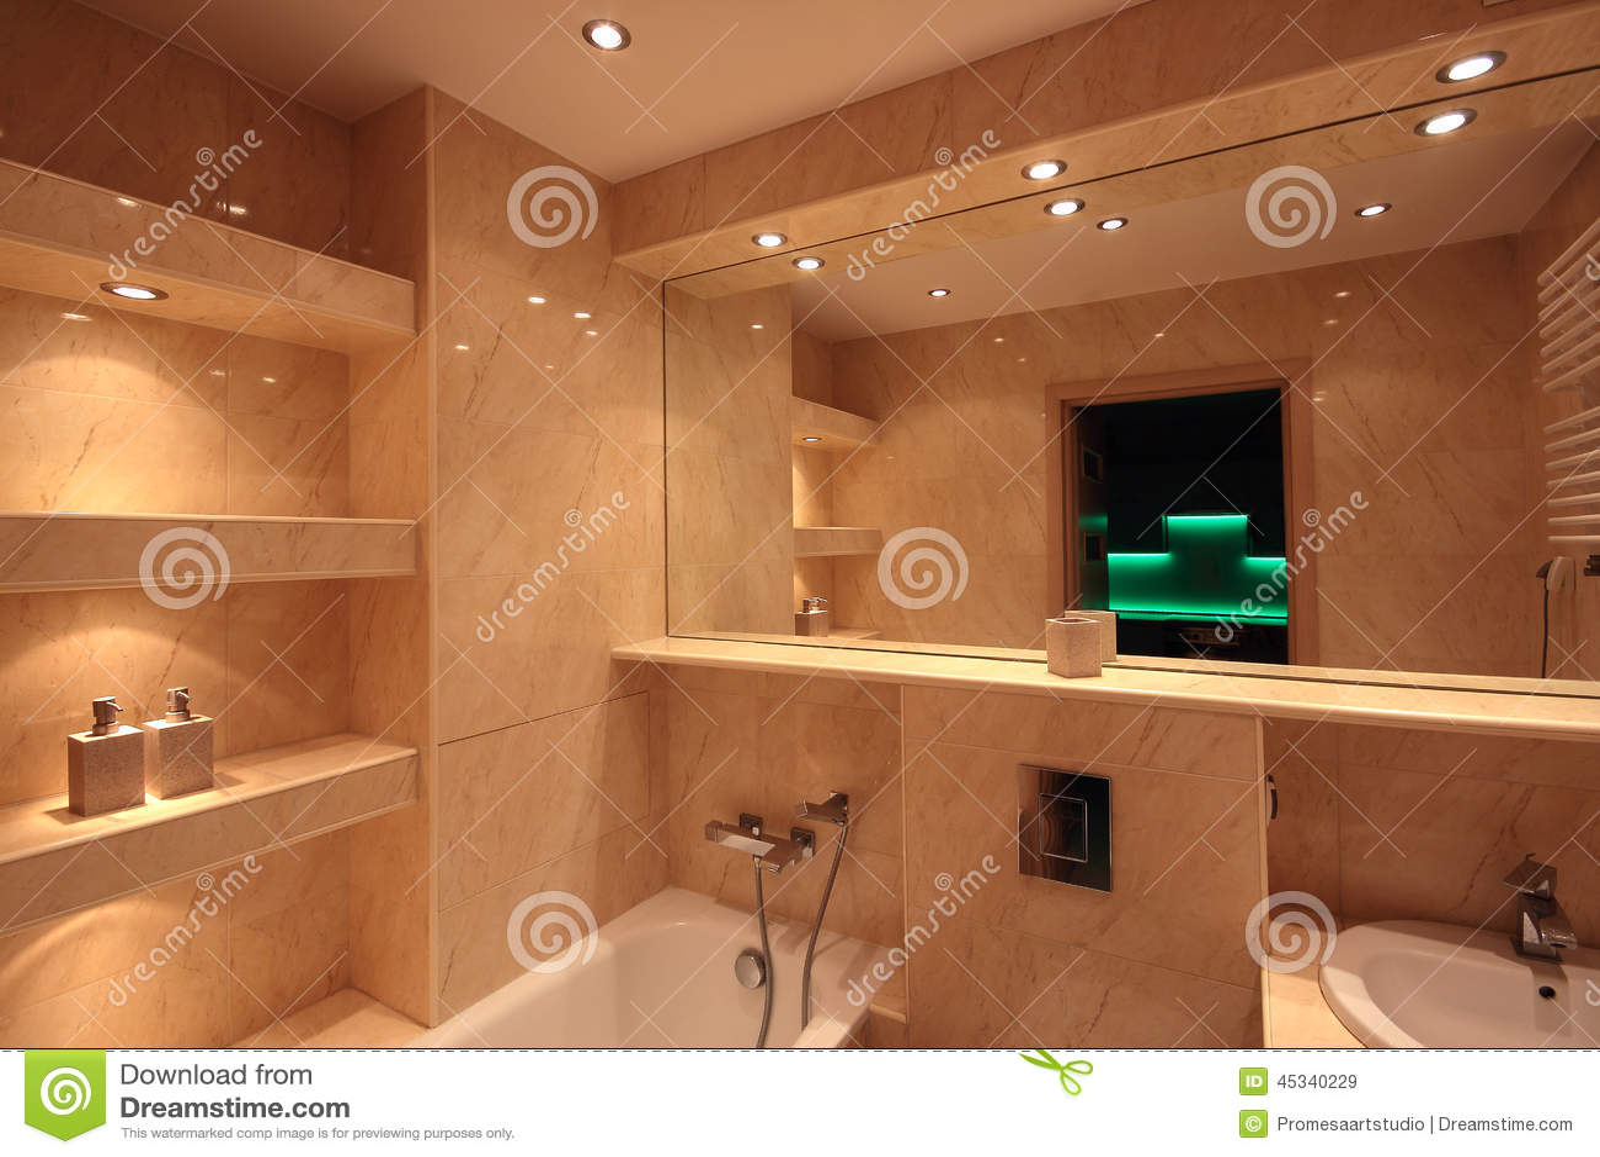 Interieur maison moderne salle de bain for Interieur de salle de bain